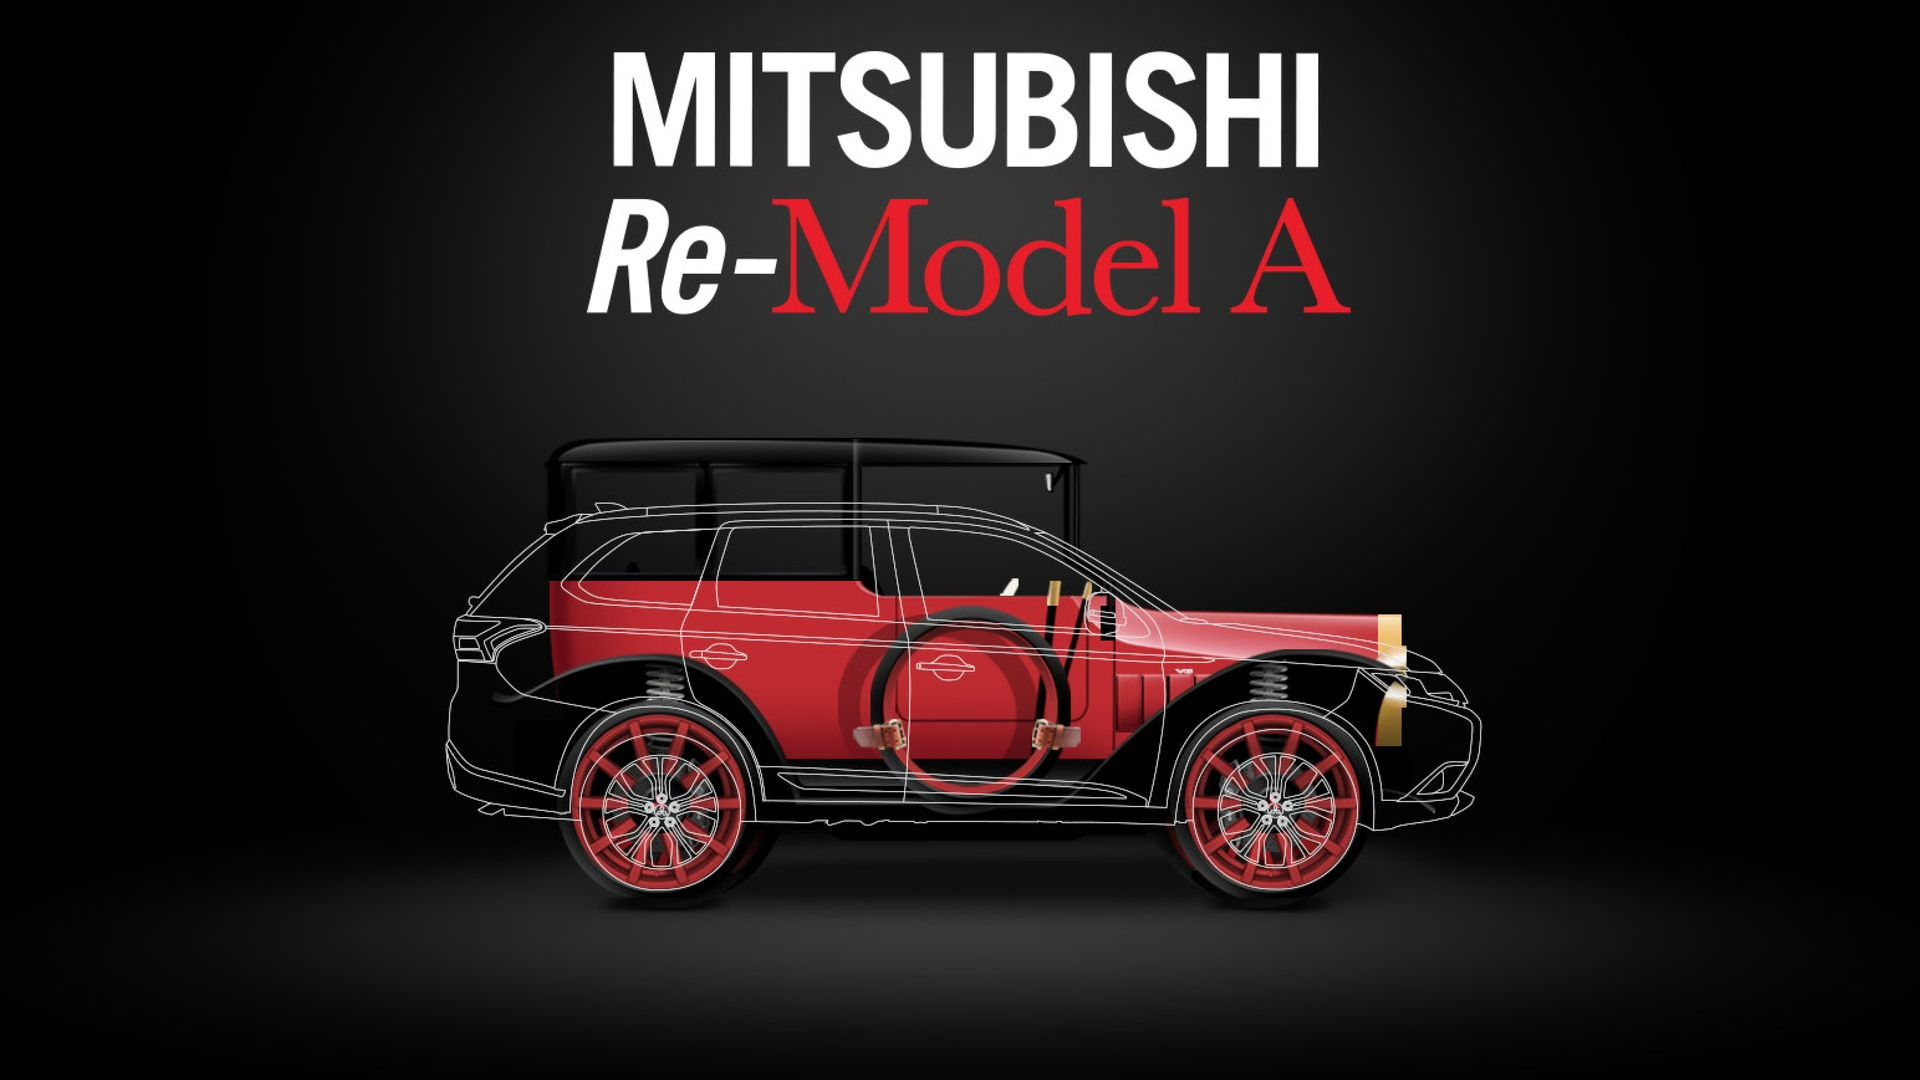 Mitsubishi Re-Model A centennial project